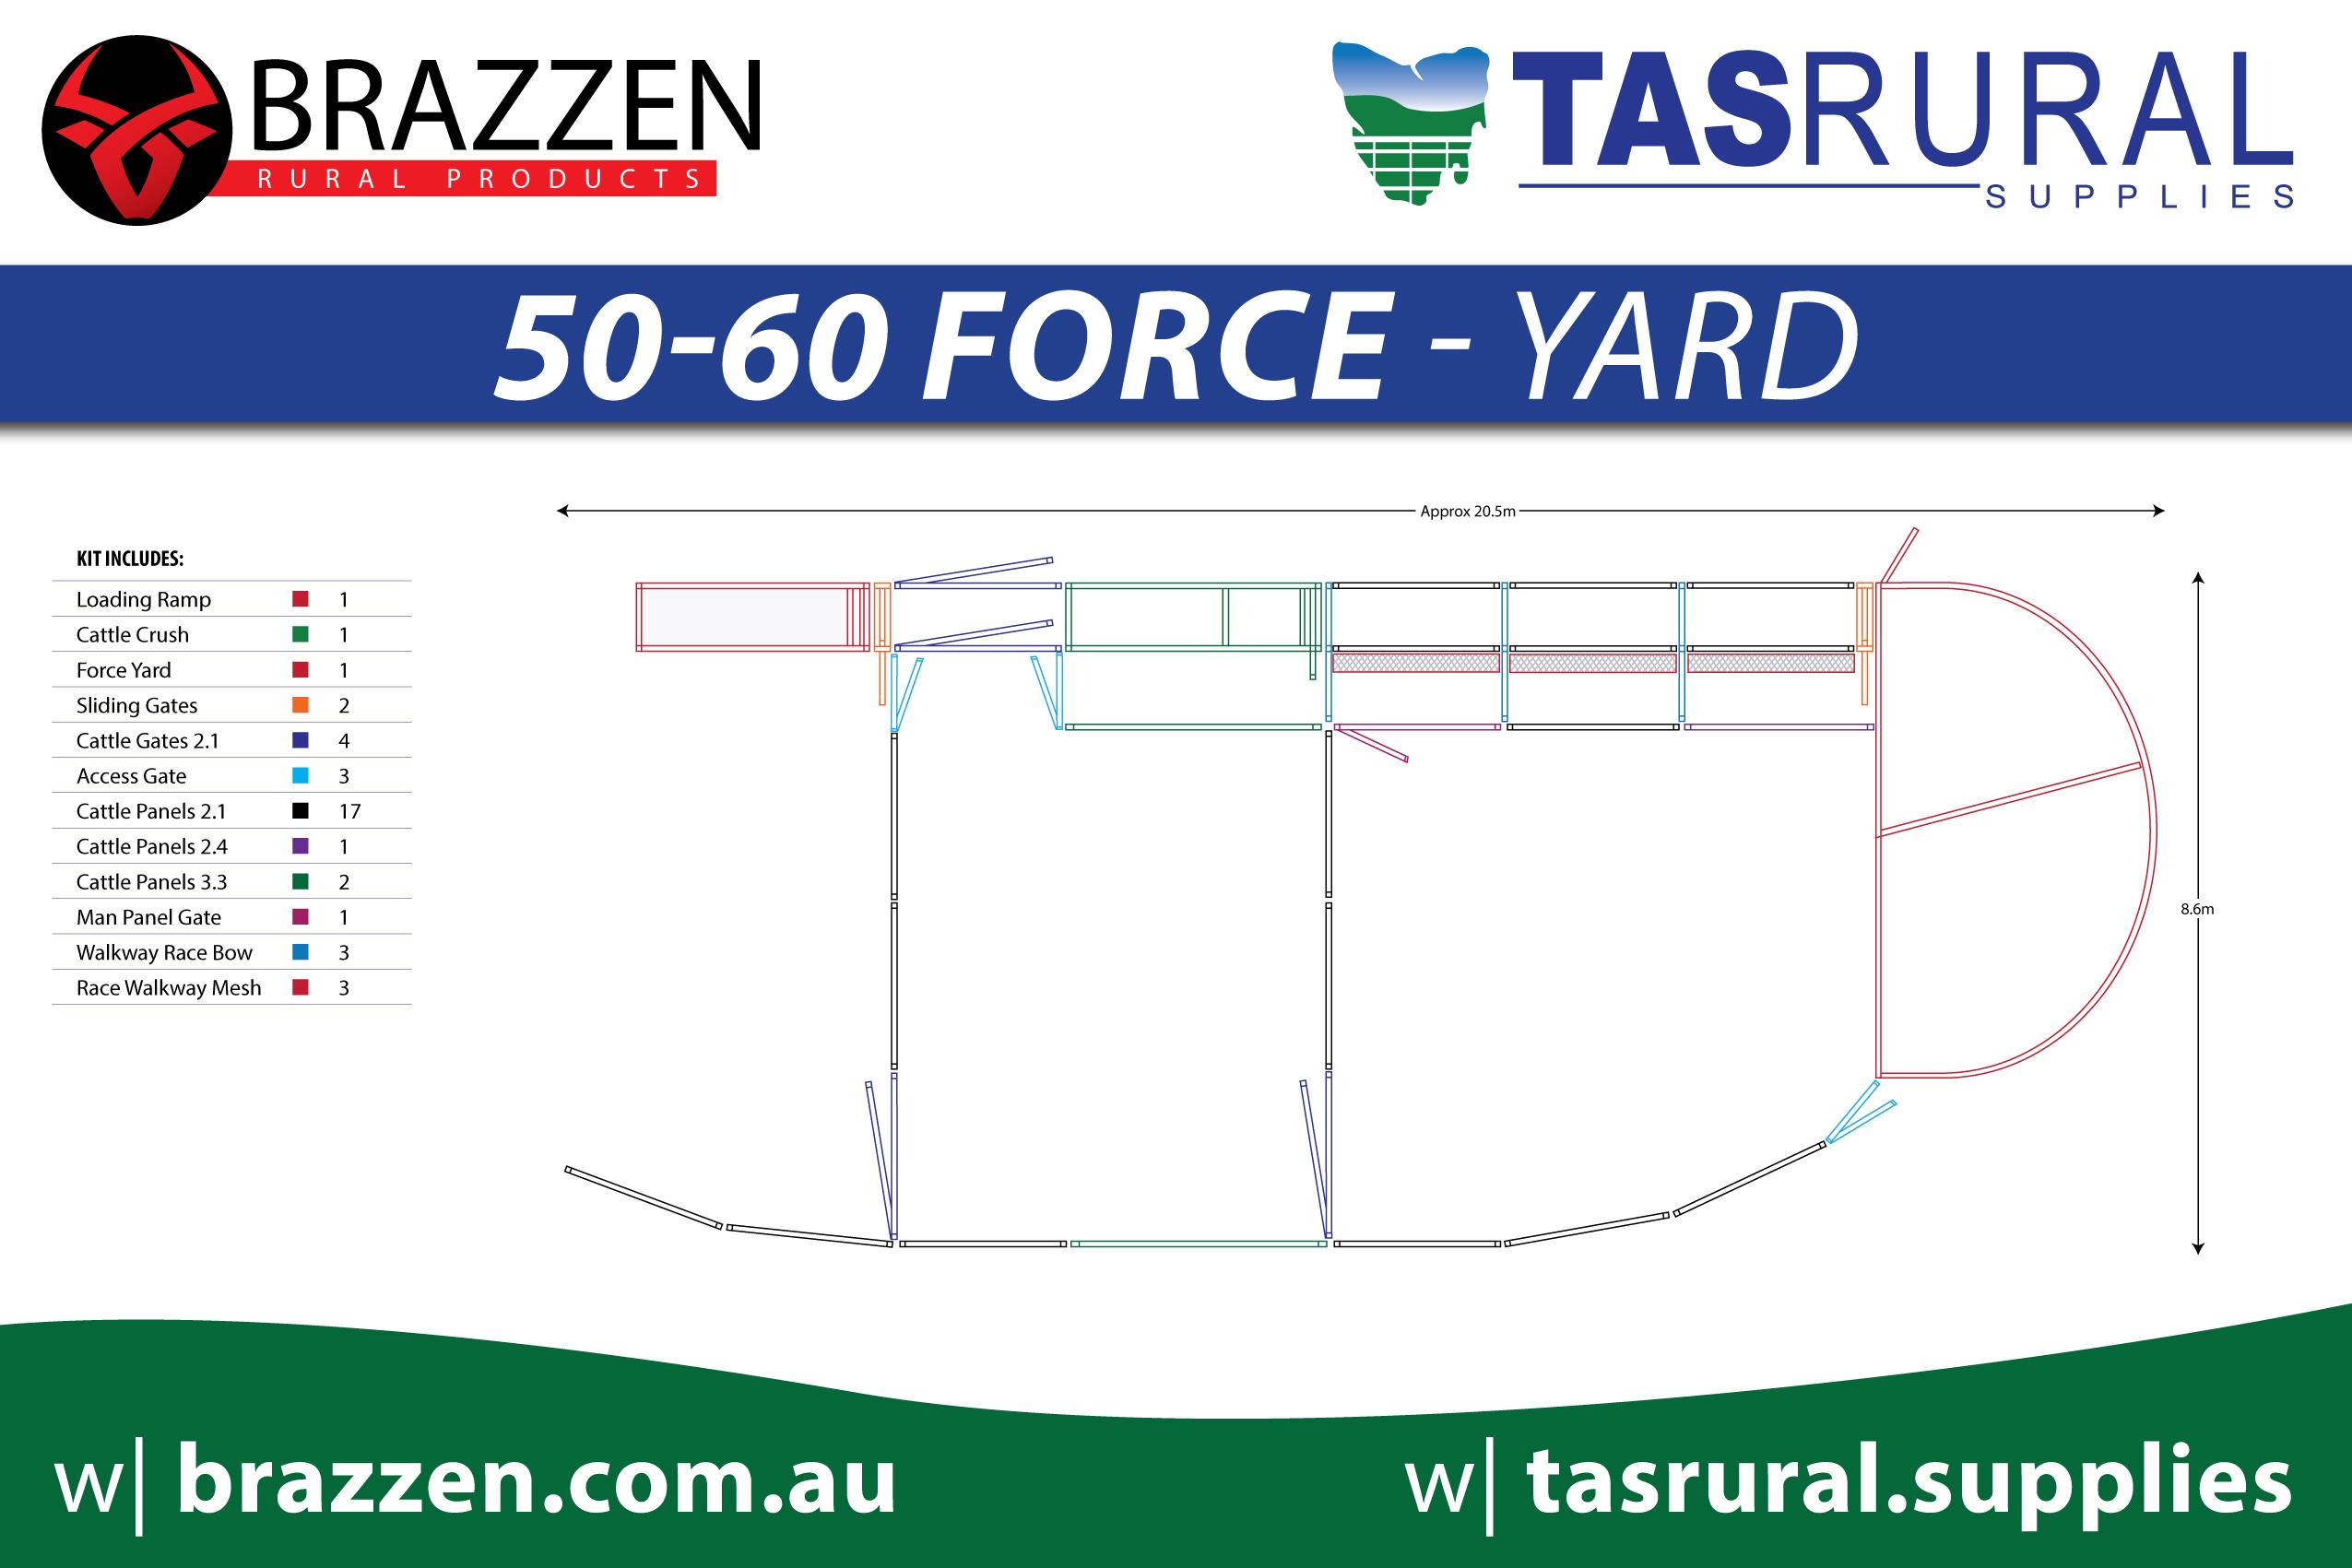 50-60 force yard